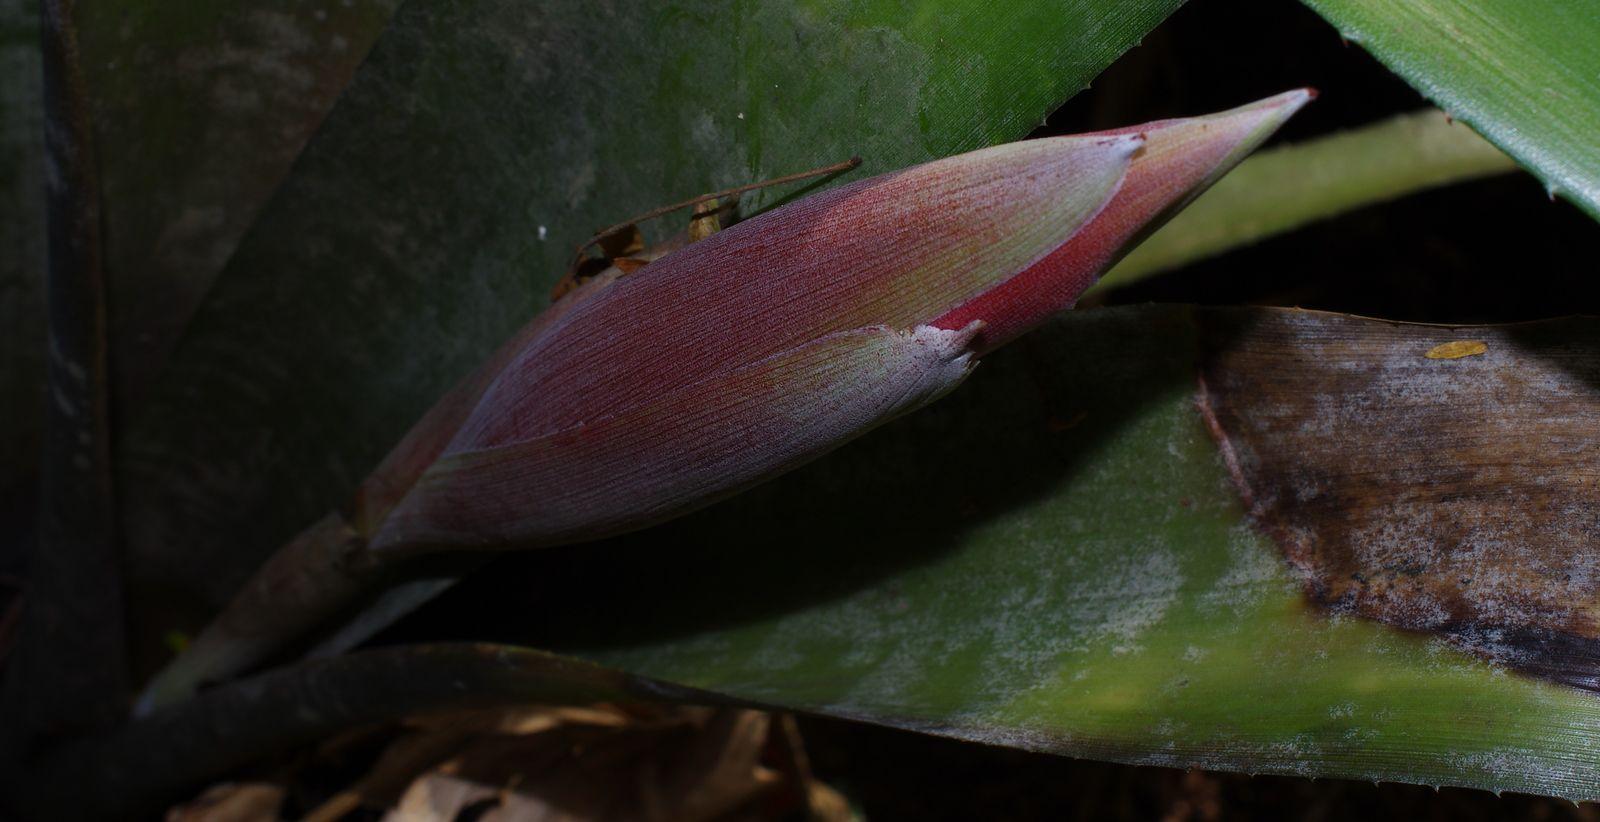 Billbergia violacea